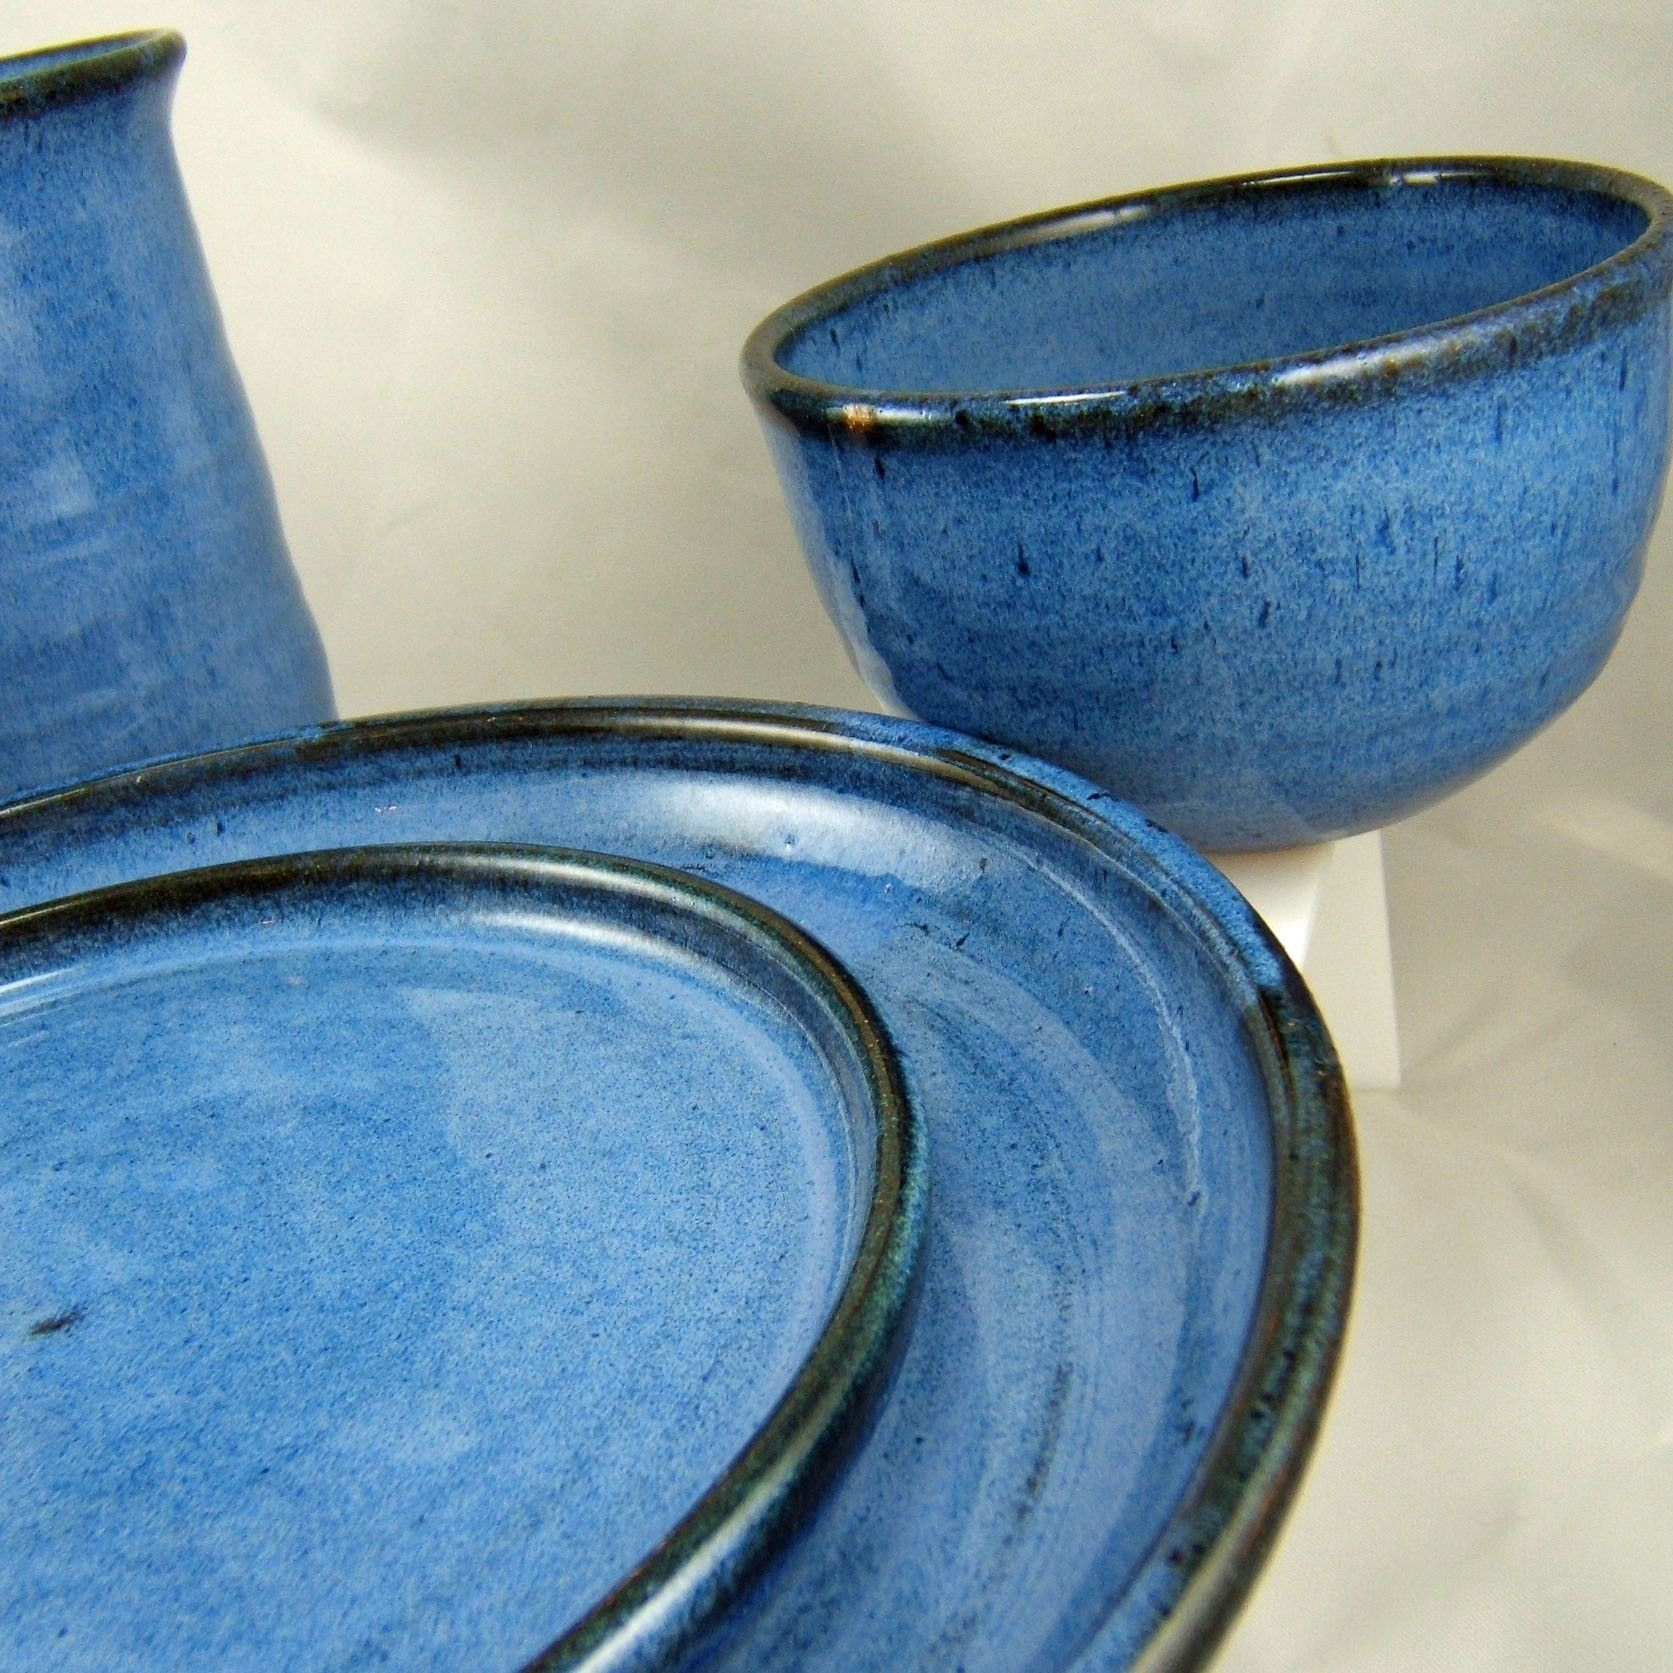 Beautiful ceramic dish ware #dishware Beautiful ceramic dish ware #dishware